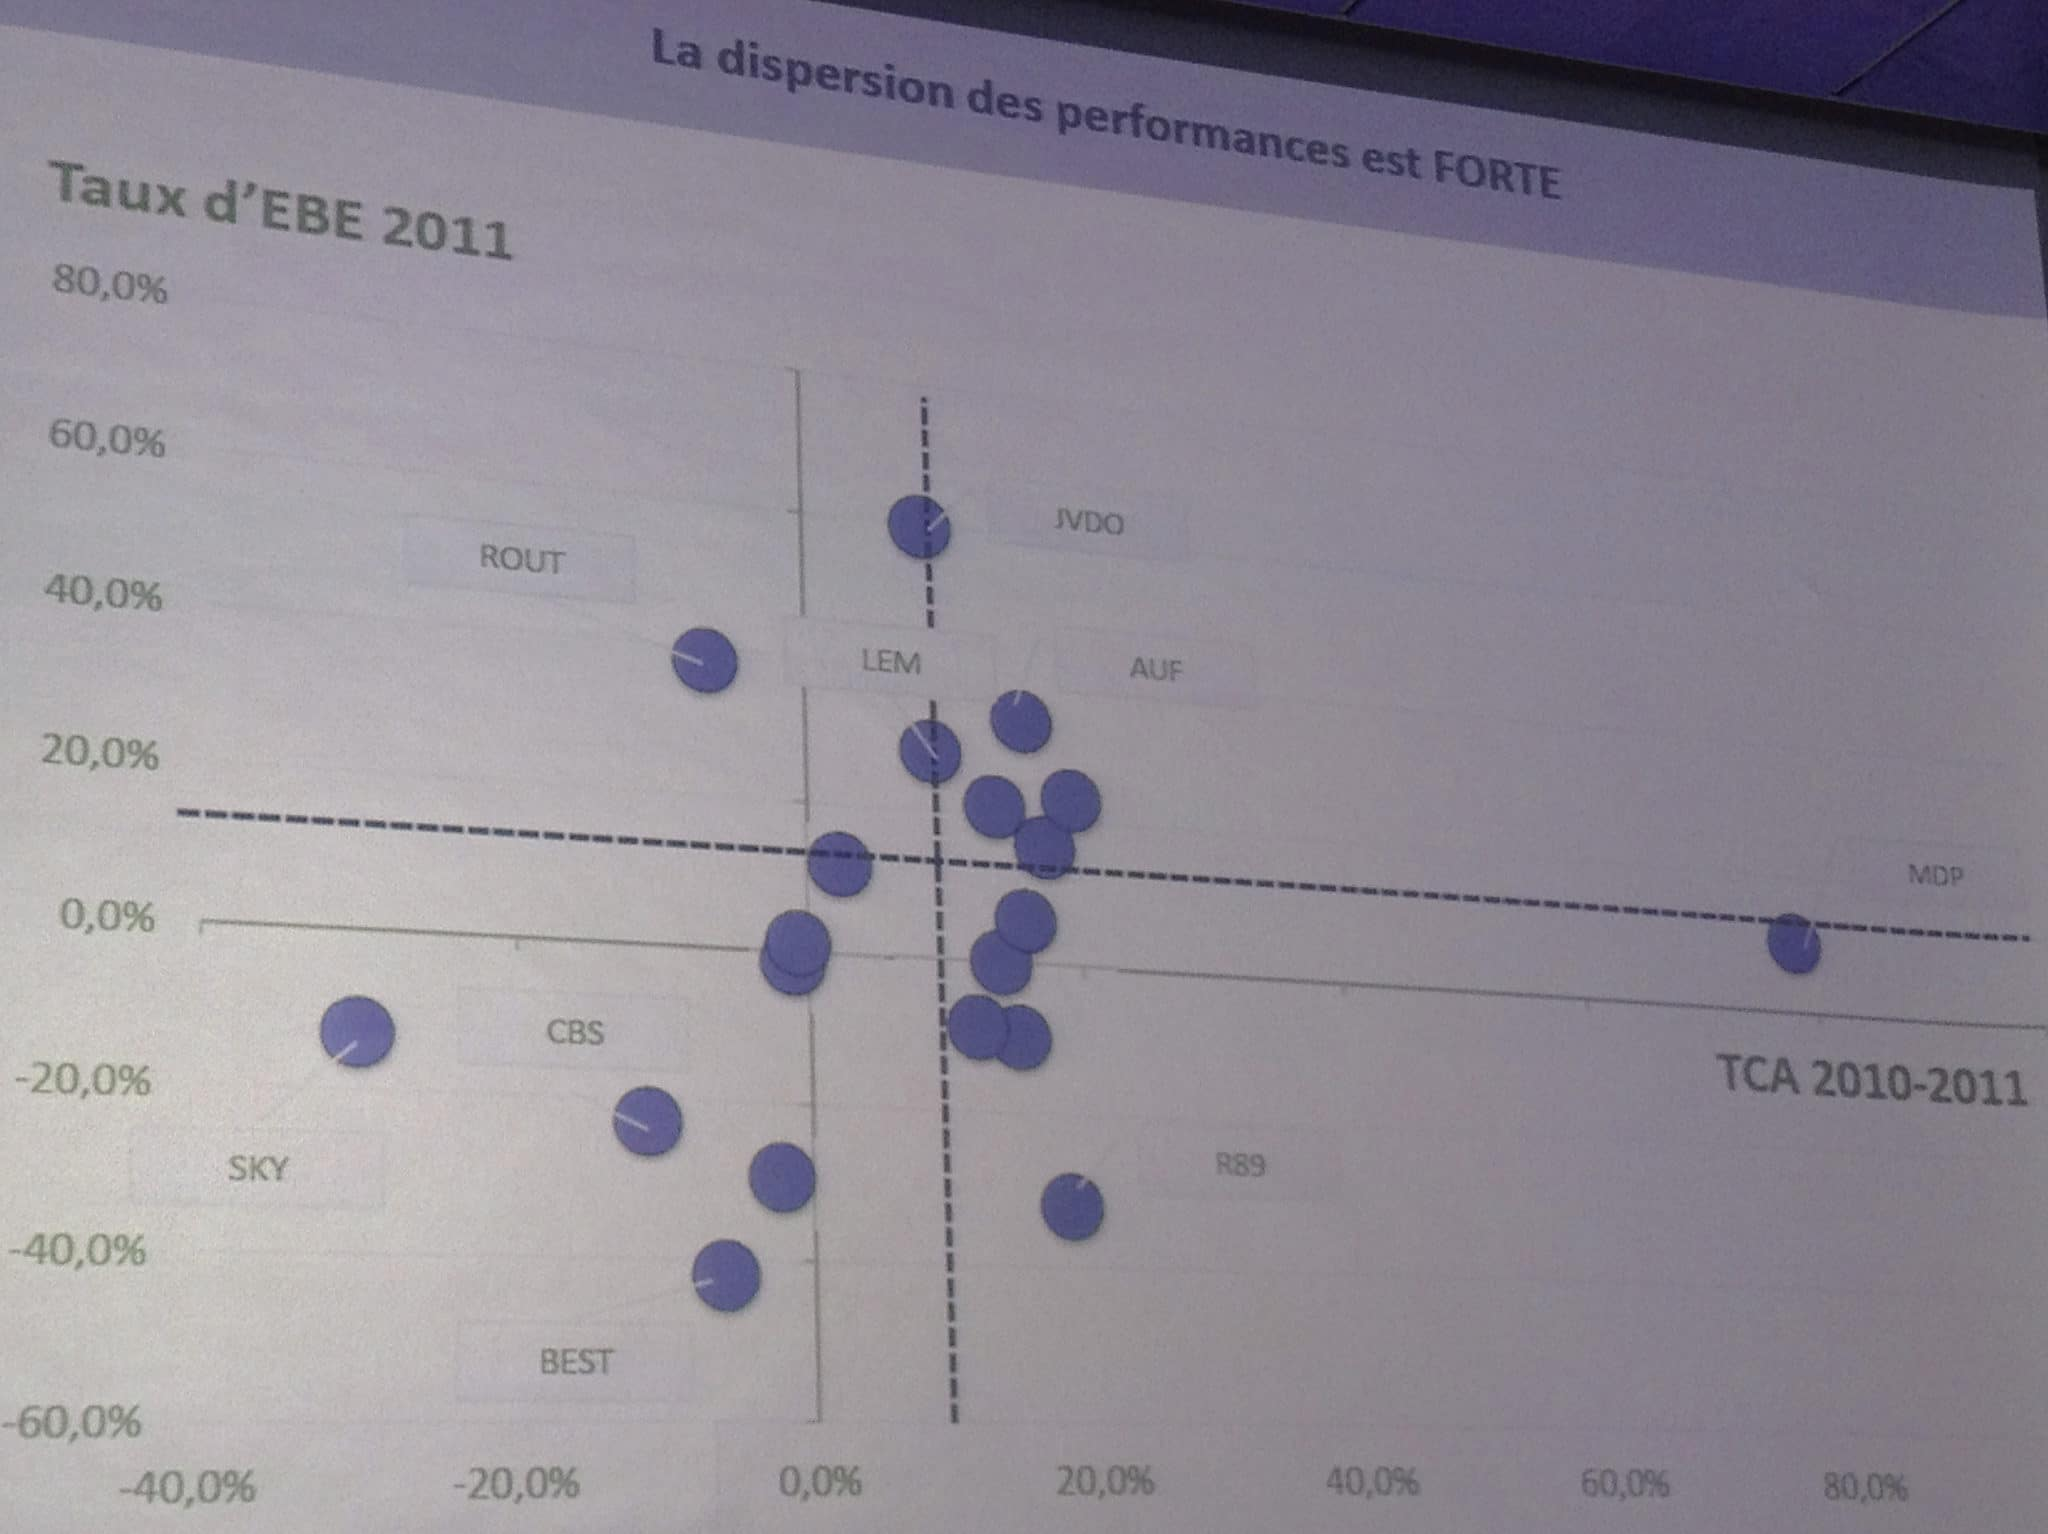 Ecarts de rentabilité entre sites - mediaculture.fr